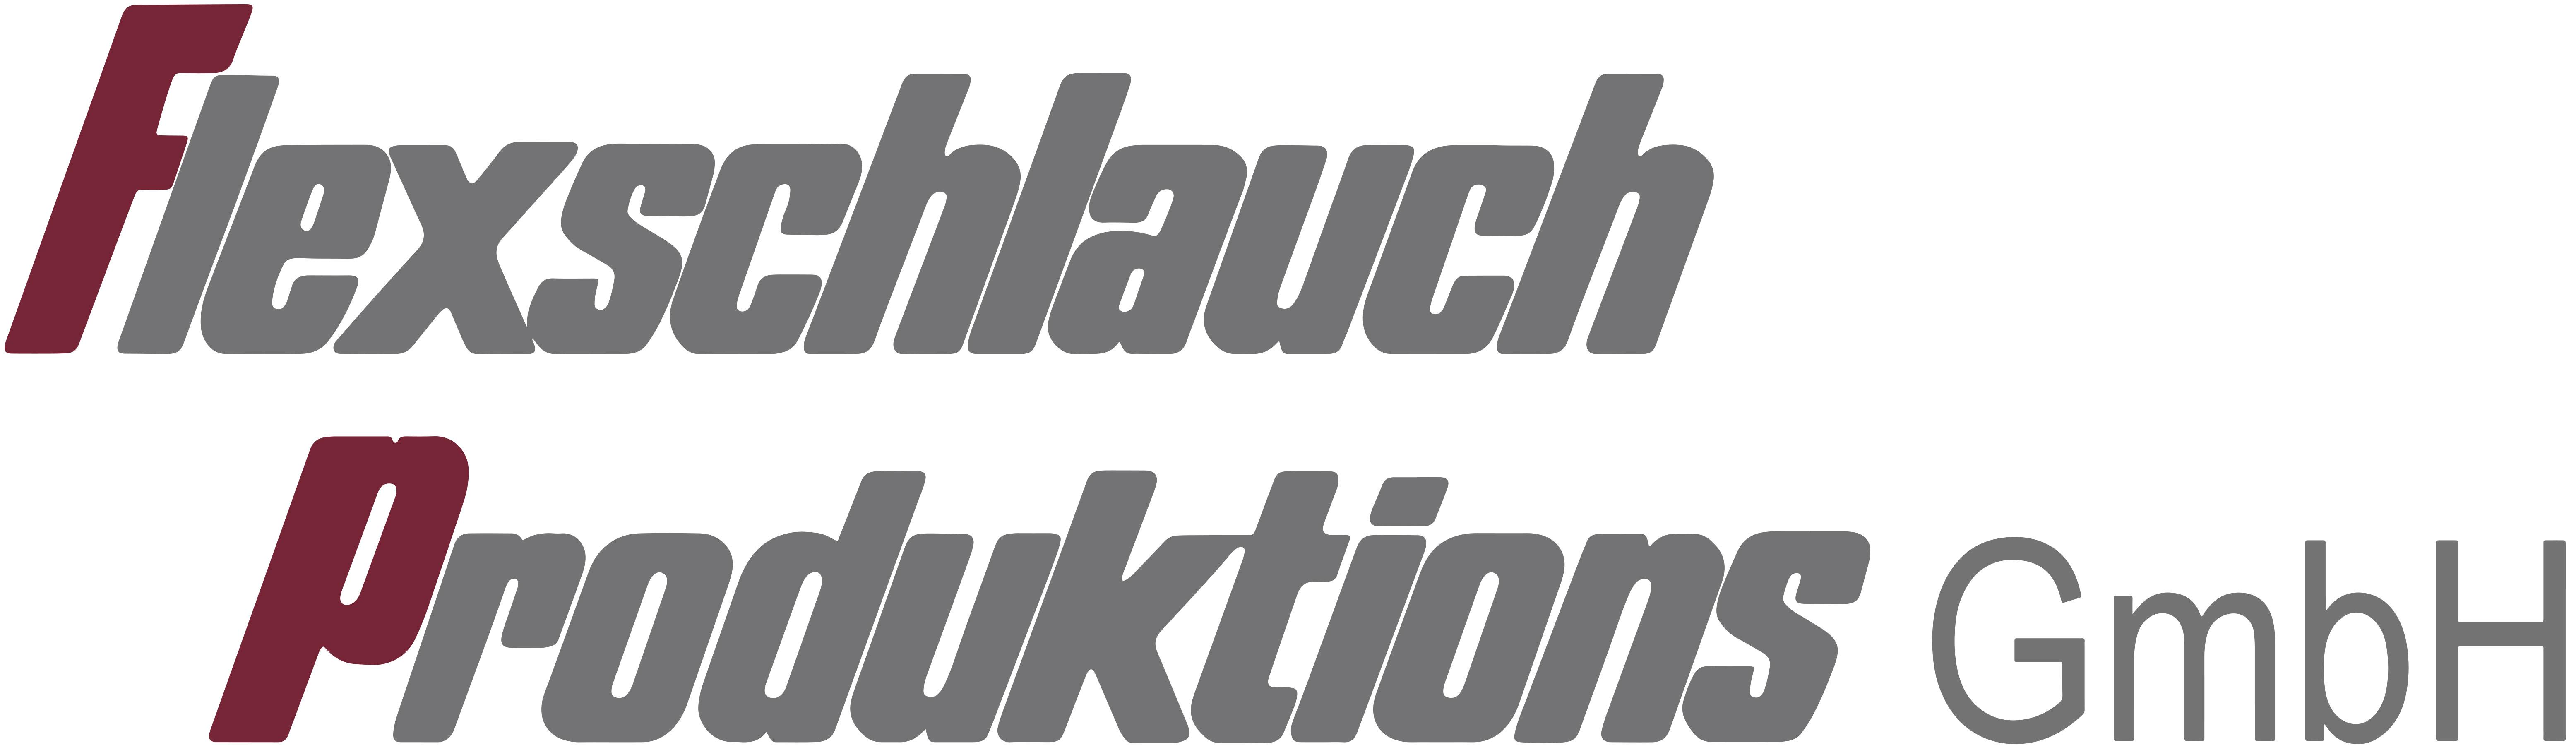 flexschlauch